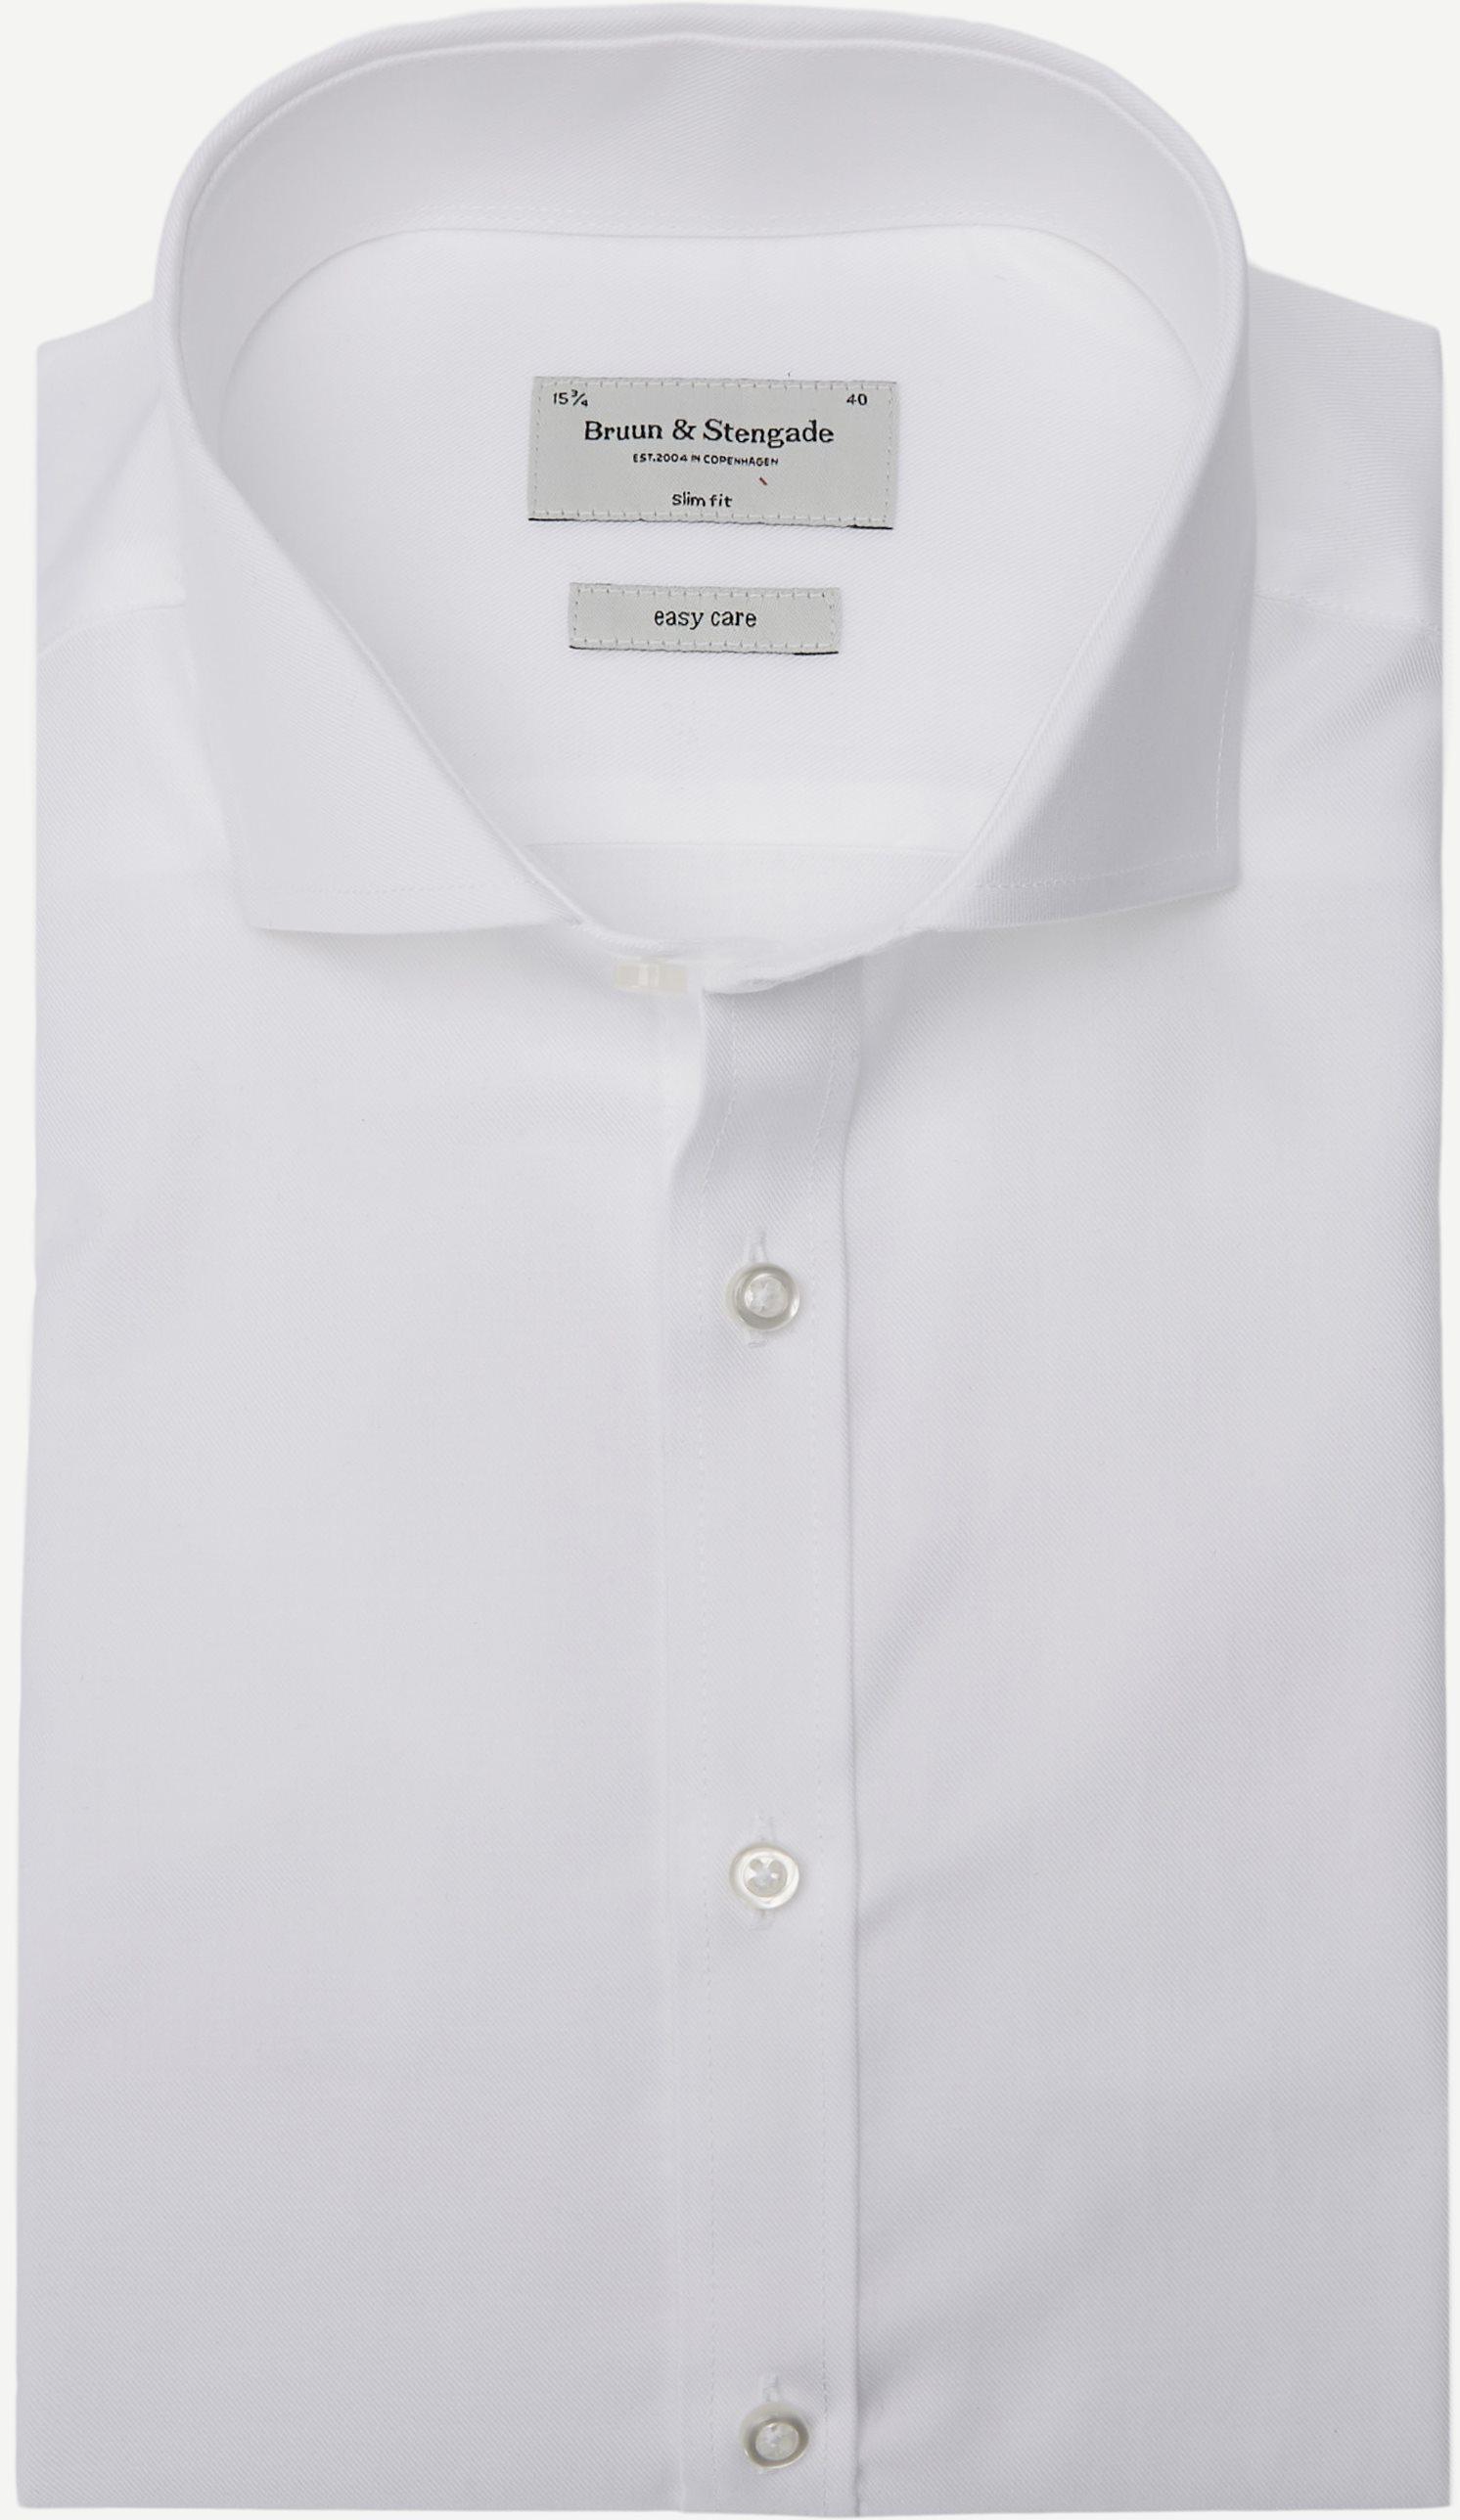 Leonardo Skjorte - Skjorter - Slim fit - Hvid